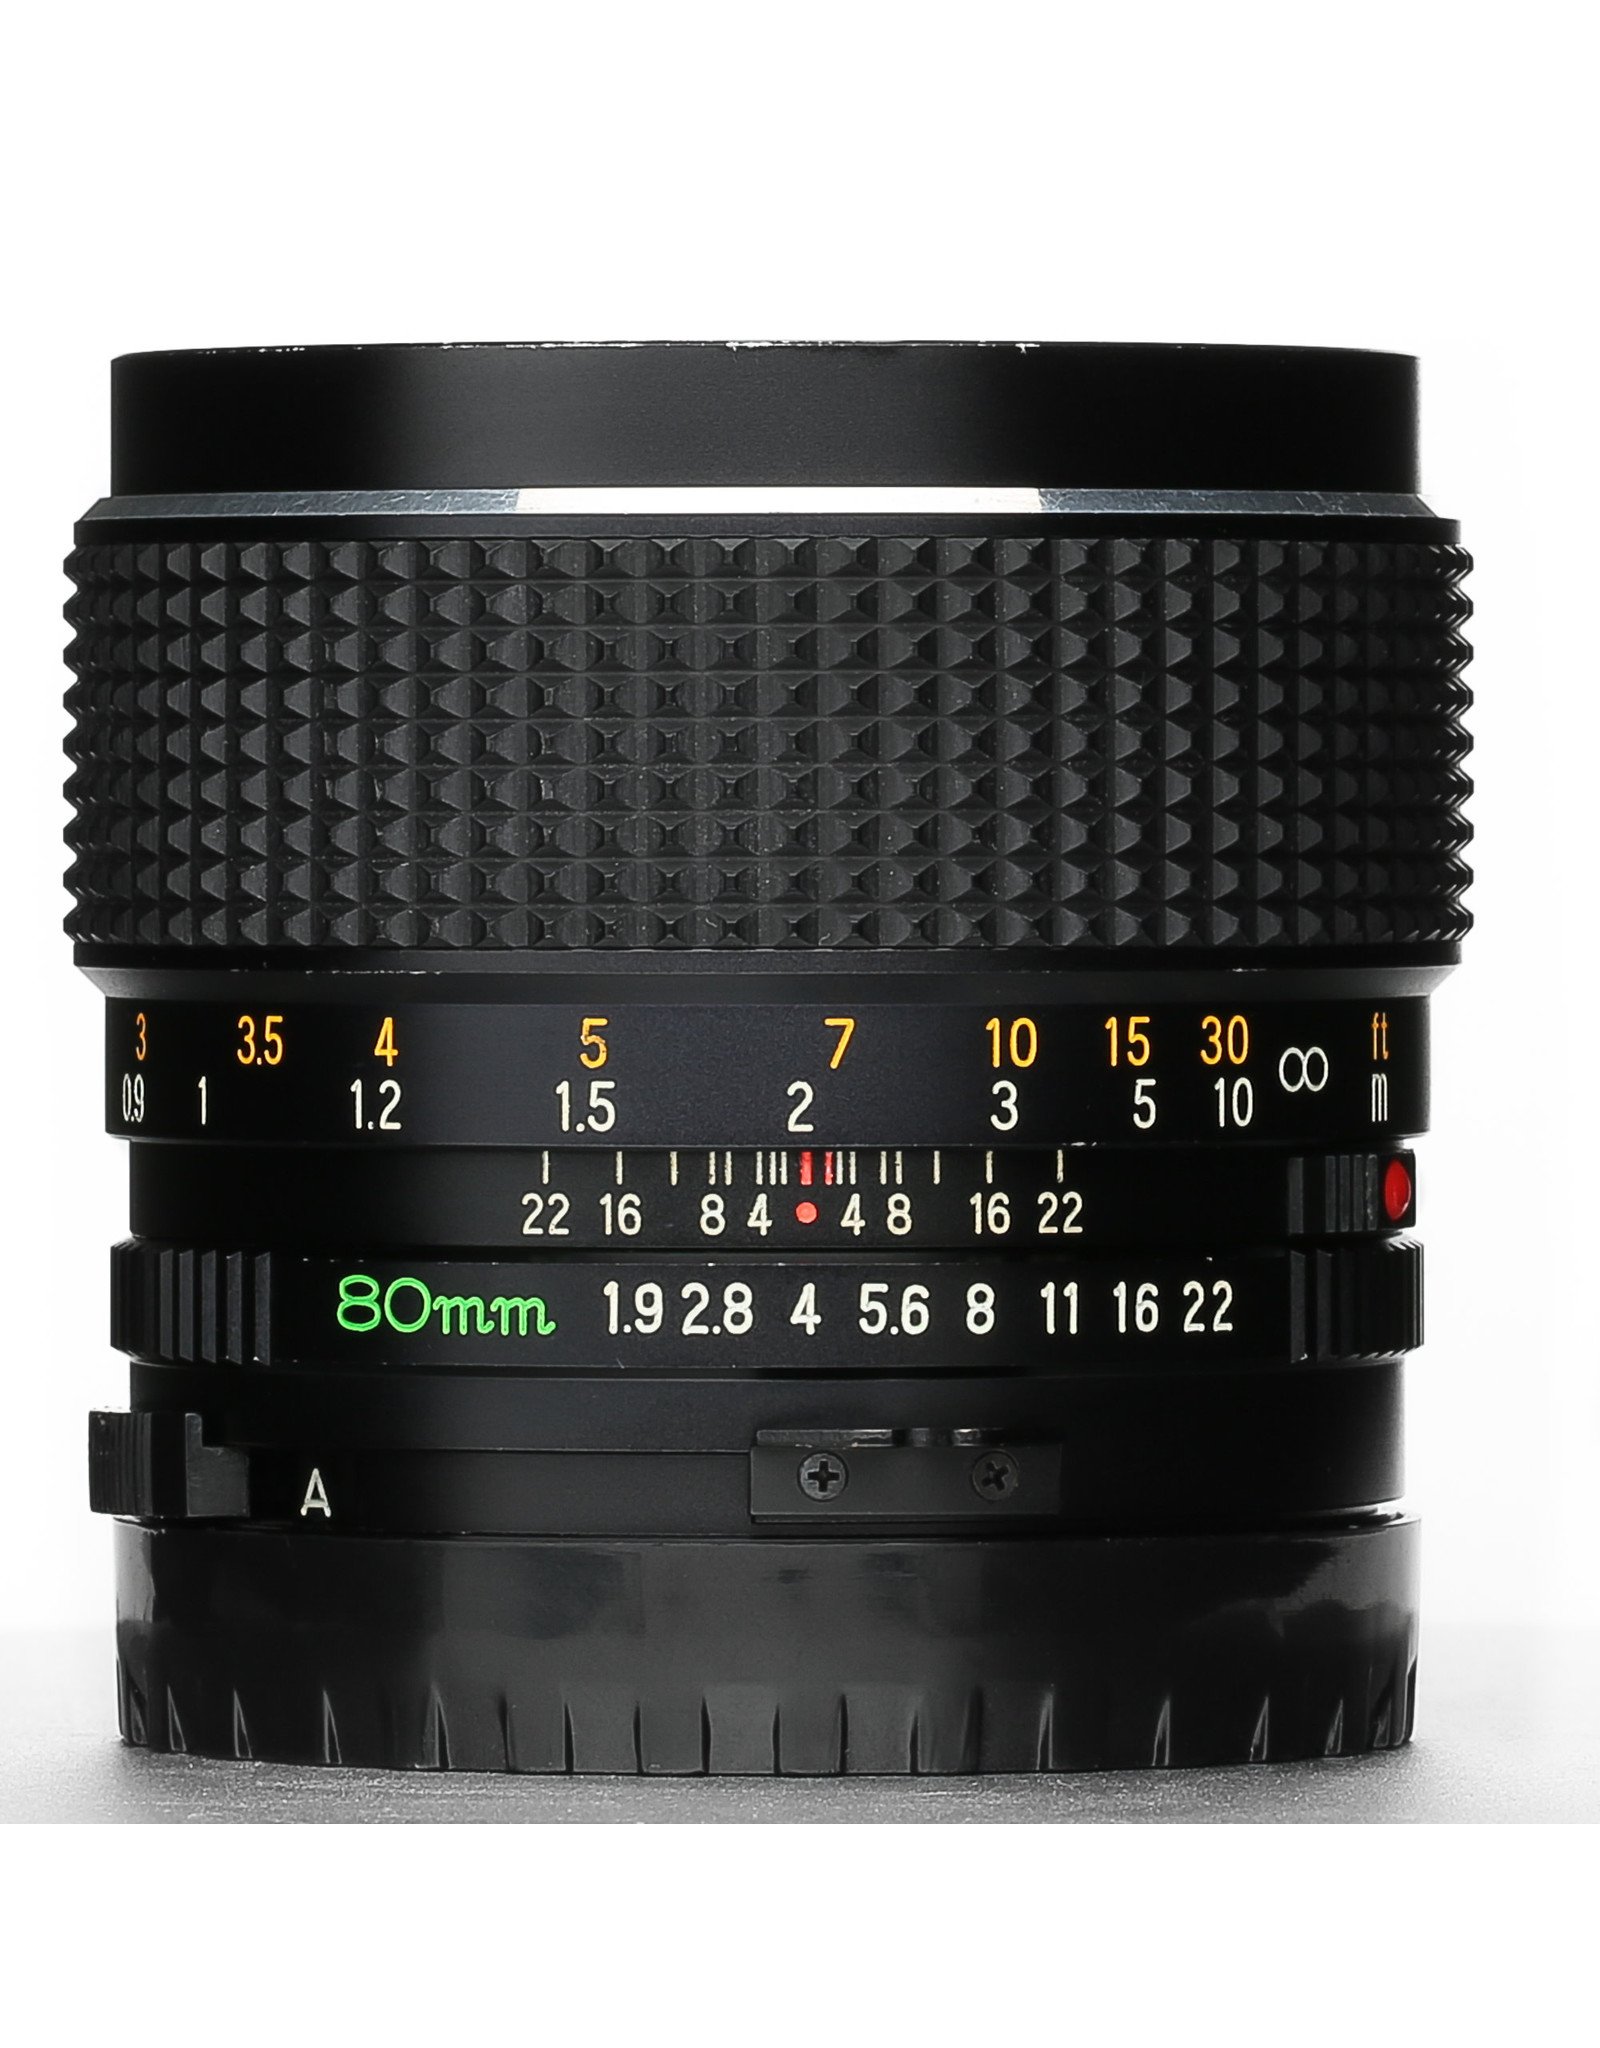 Mamiya Mamiya 80mm f/1.9 Lens for 645